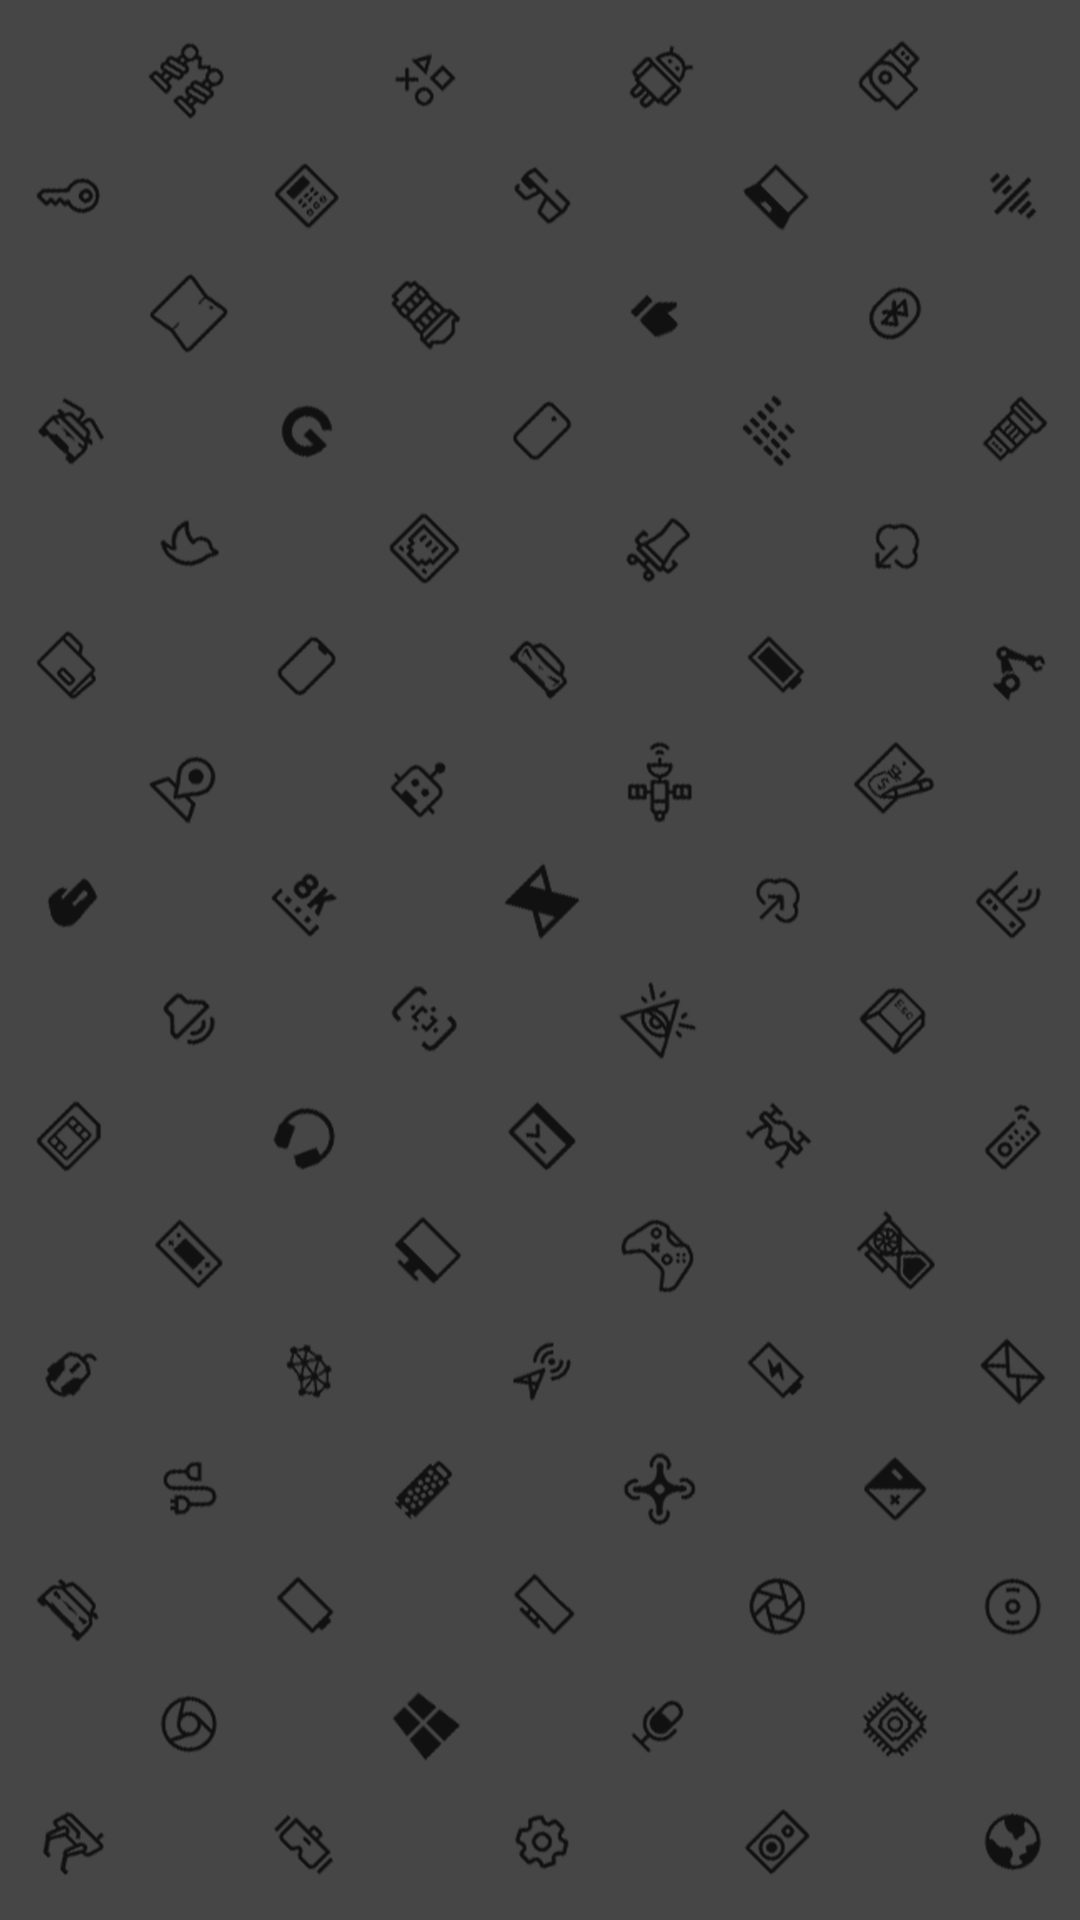 mkbhd icons black phone wallpaper